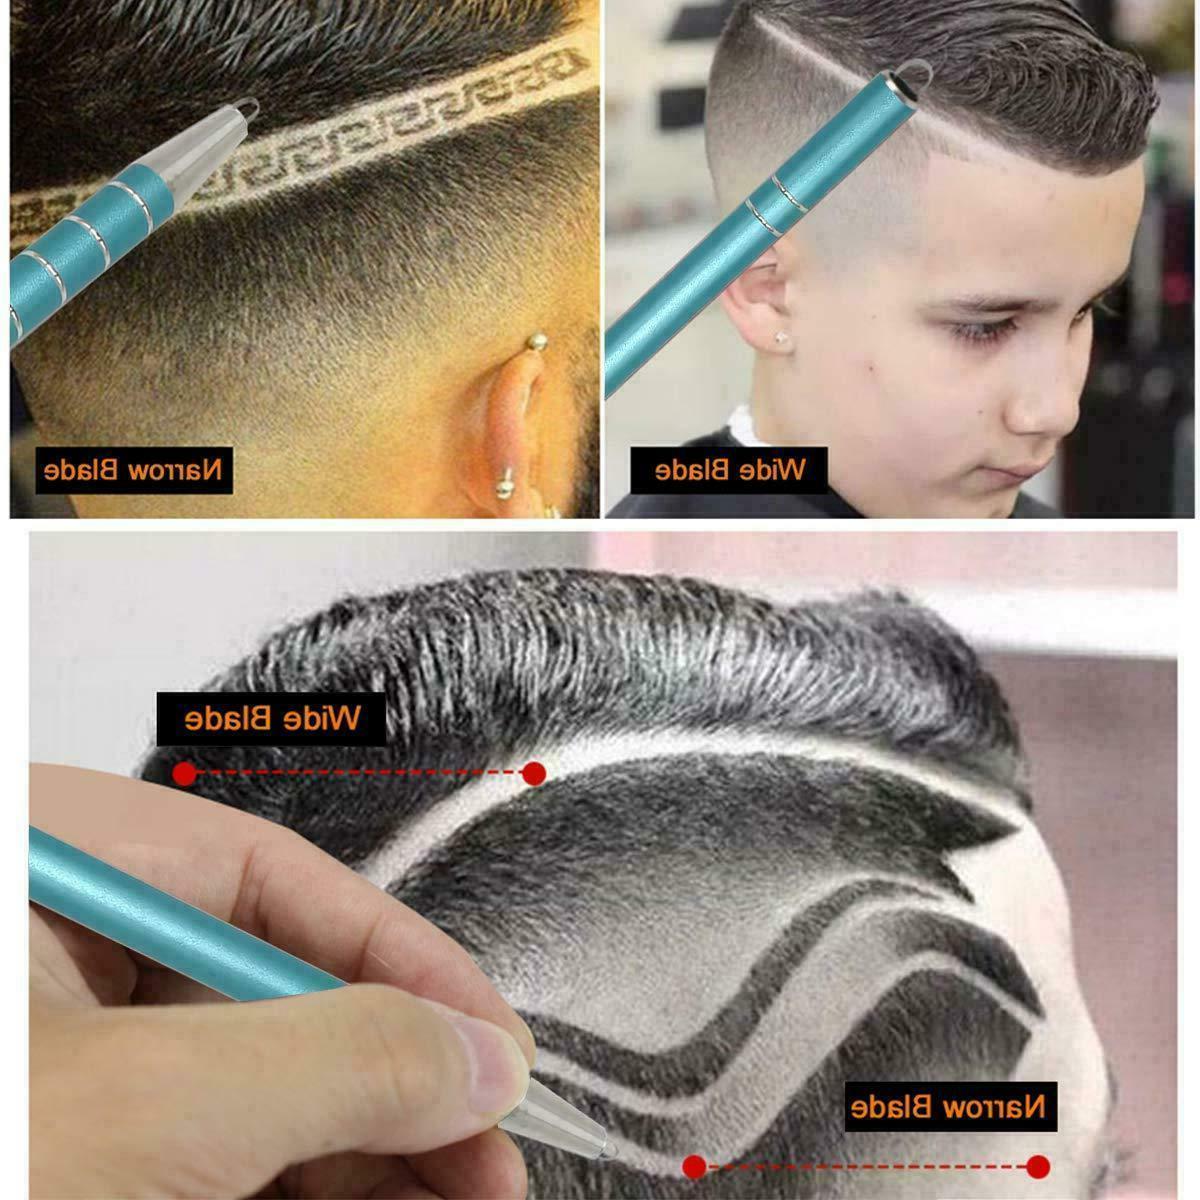 Hair Cutting Tools Engraving Tattoo Pen Razor Trim Styling F